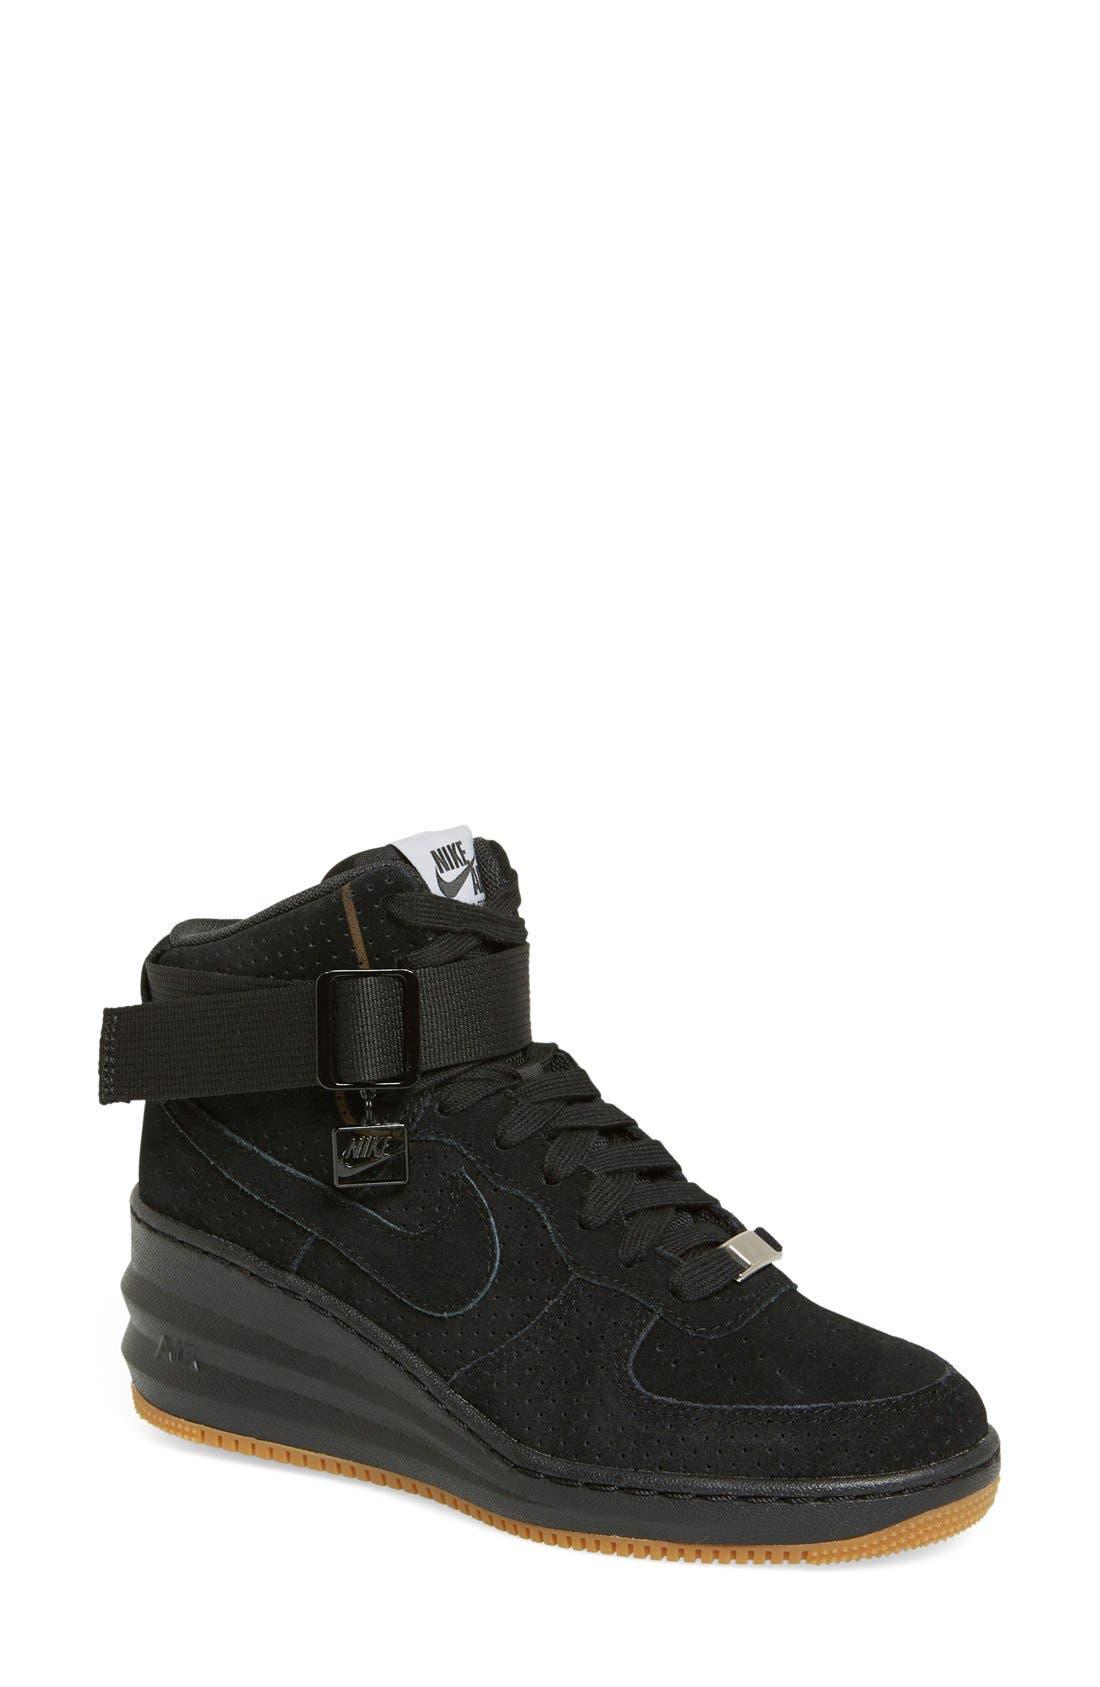 Main Image - Nike 'Lunar Force Sky Hi' Wedge Sneaker (Women)